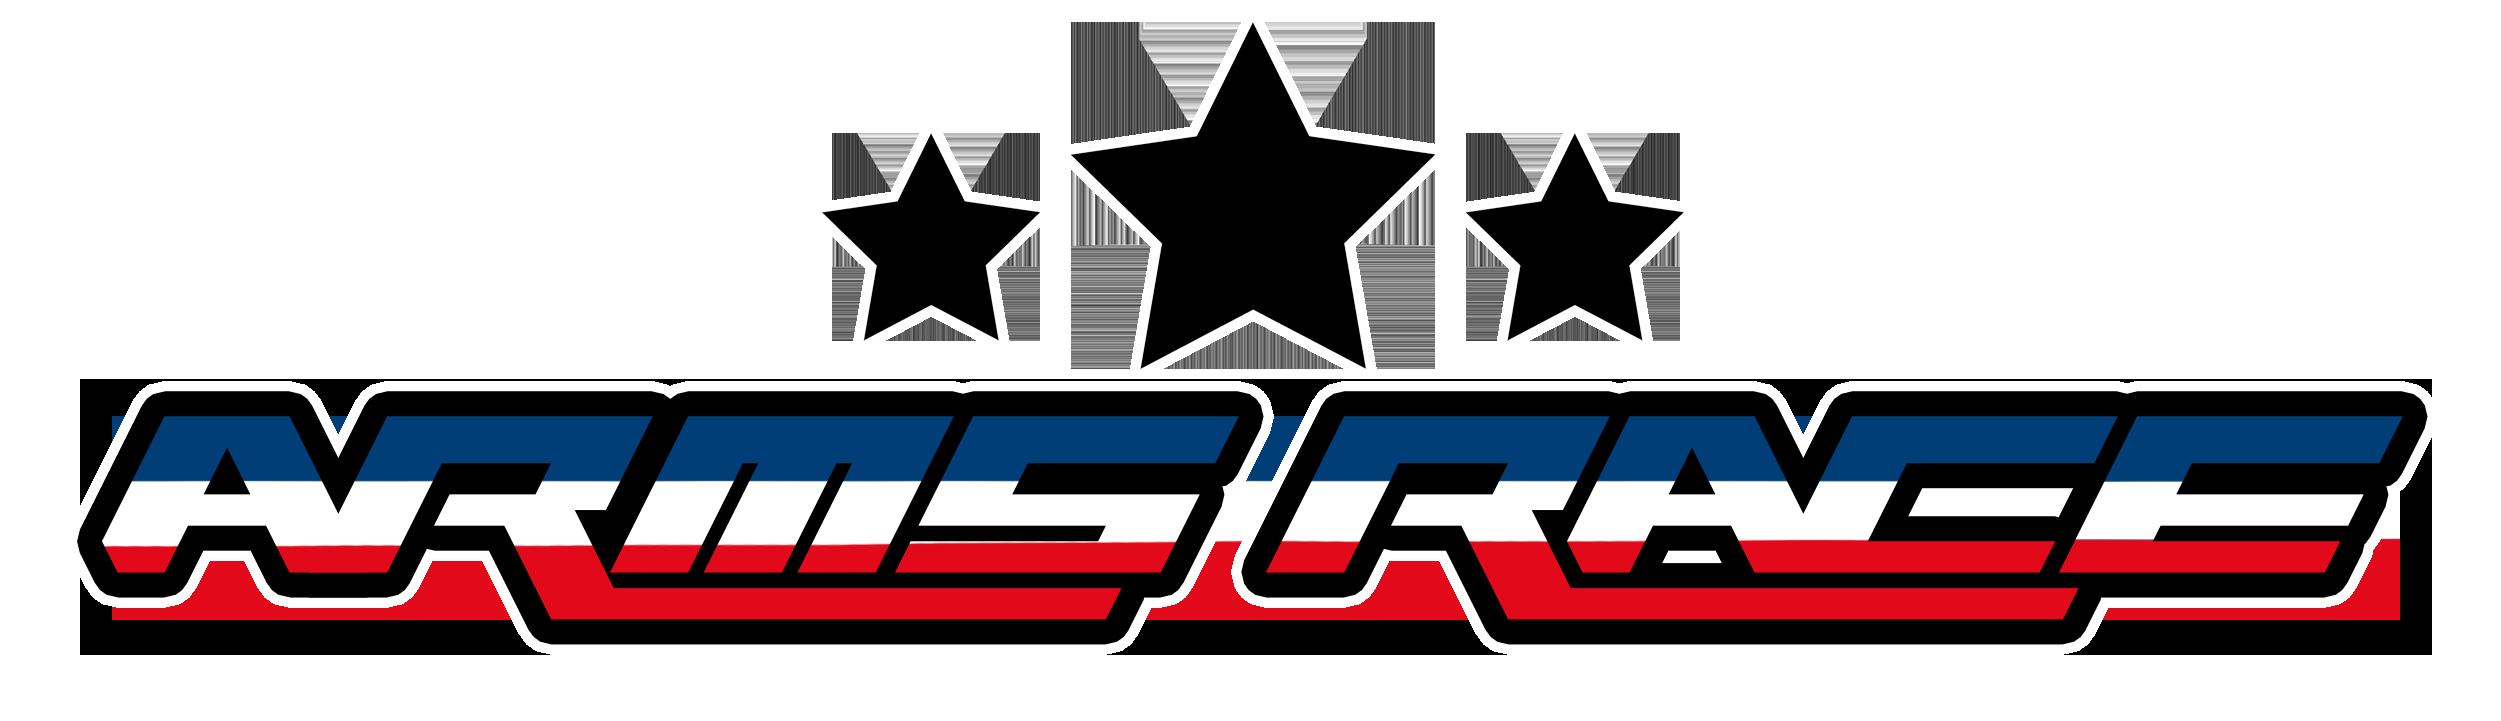 armsrace logo